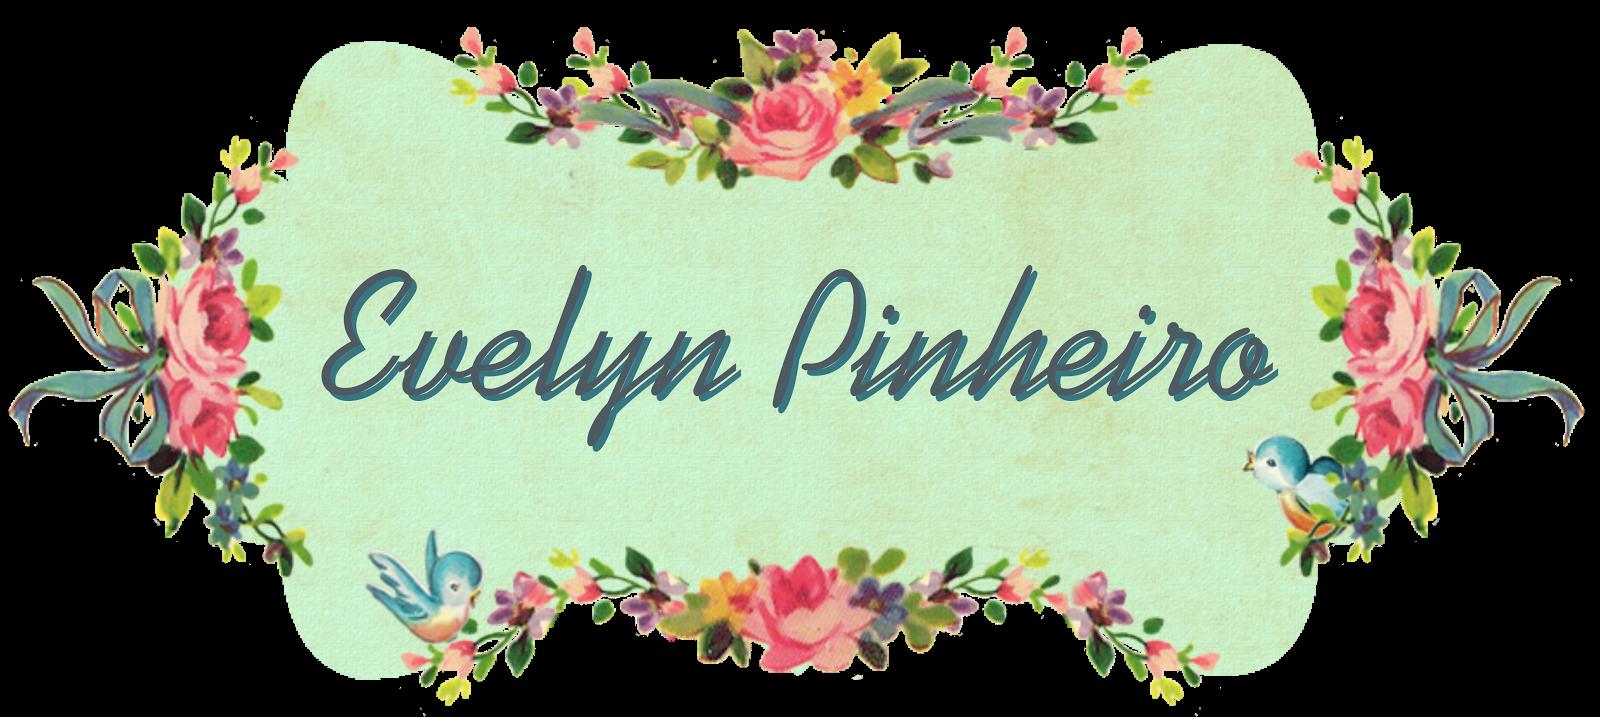 Evelyn Pinheiro